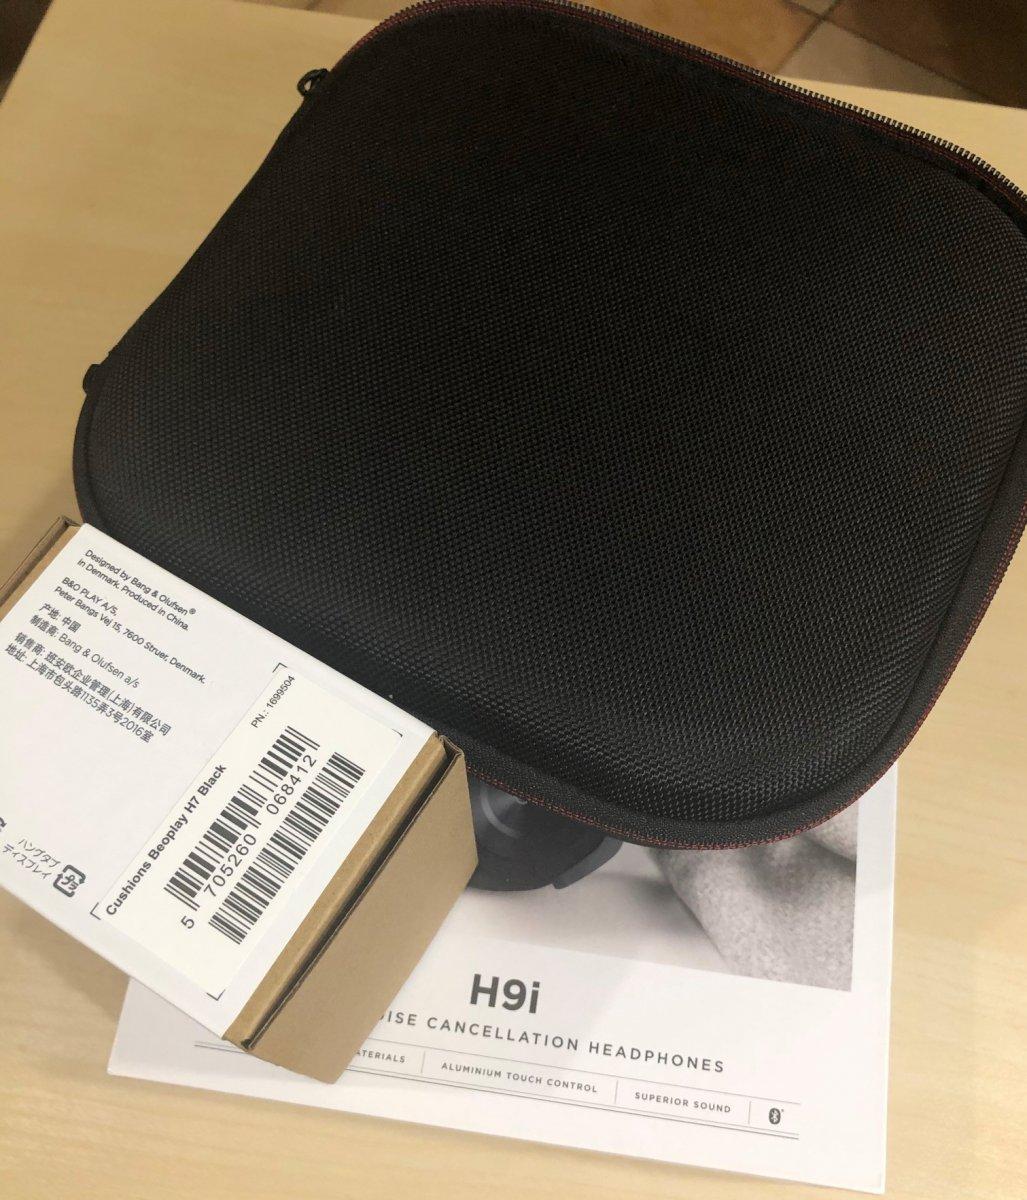 H9i_006.JPEG